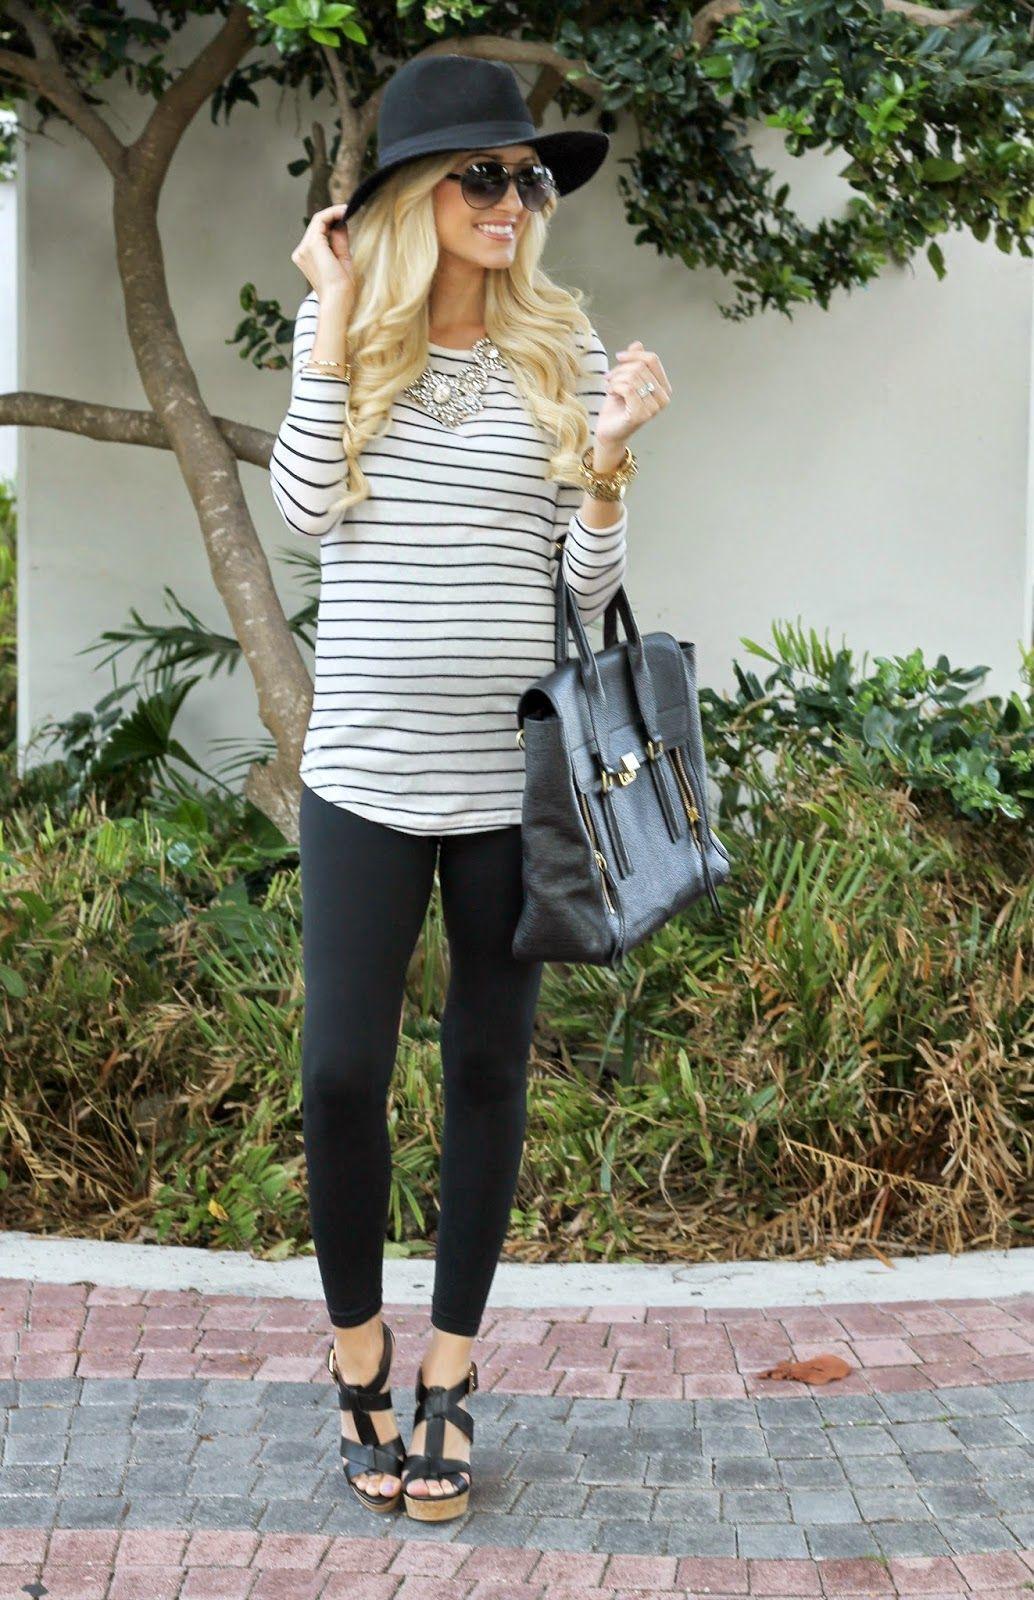 de532e8b1388f A Spoonful of Style: My Go To...   Maternity   Maternity fashion ...